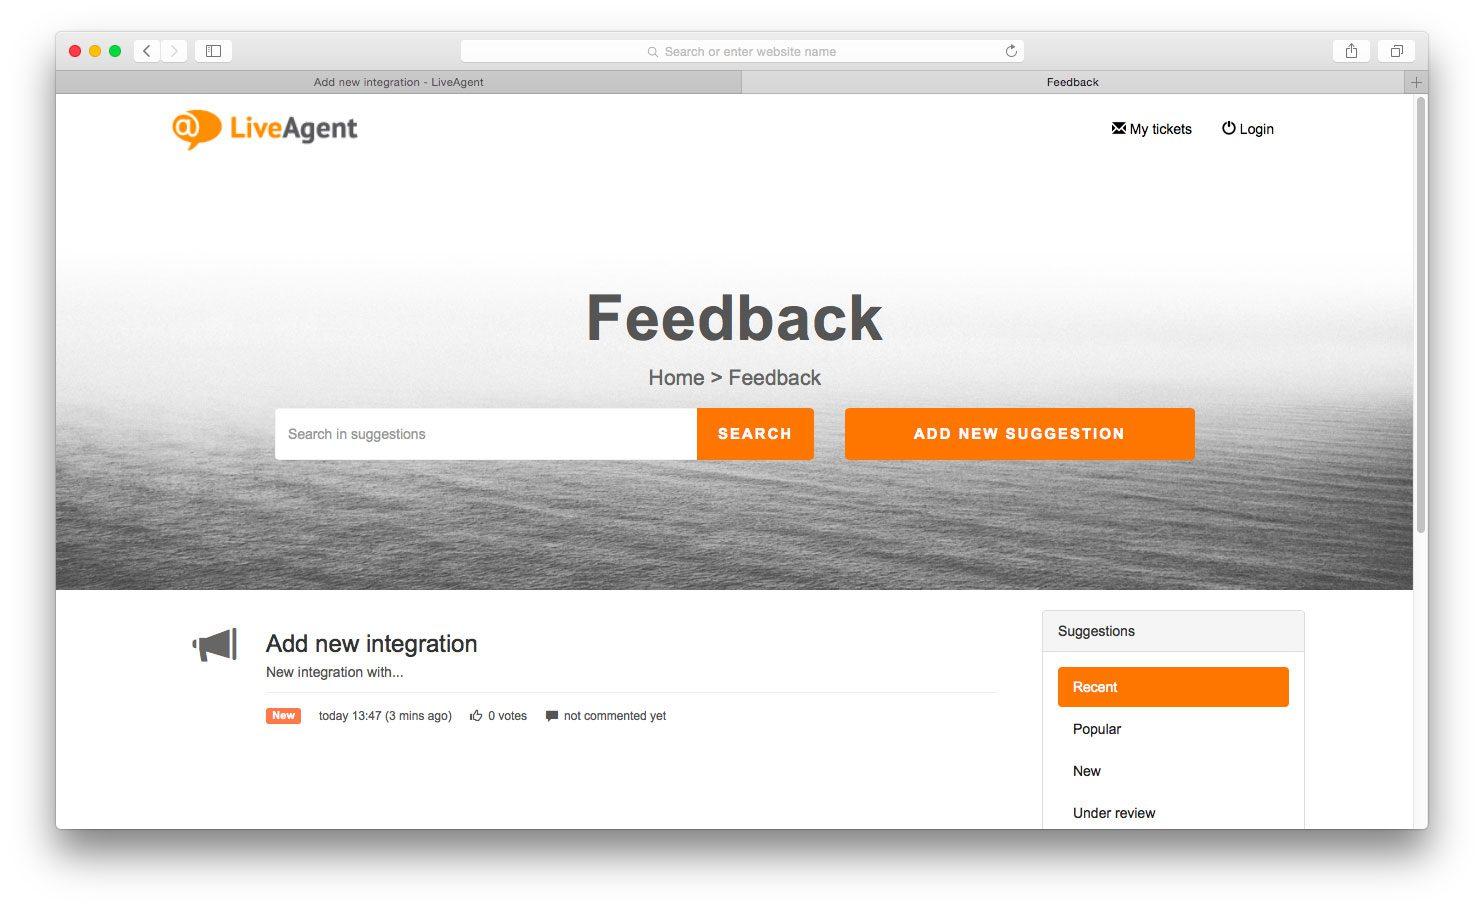 customer service duties - collect feedback